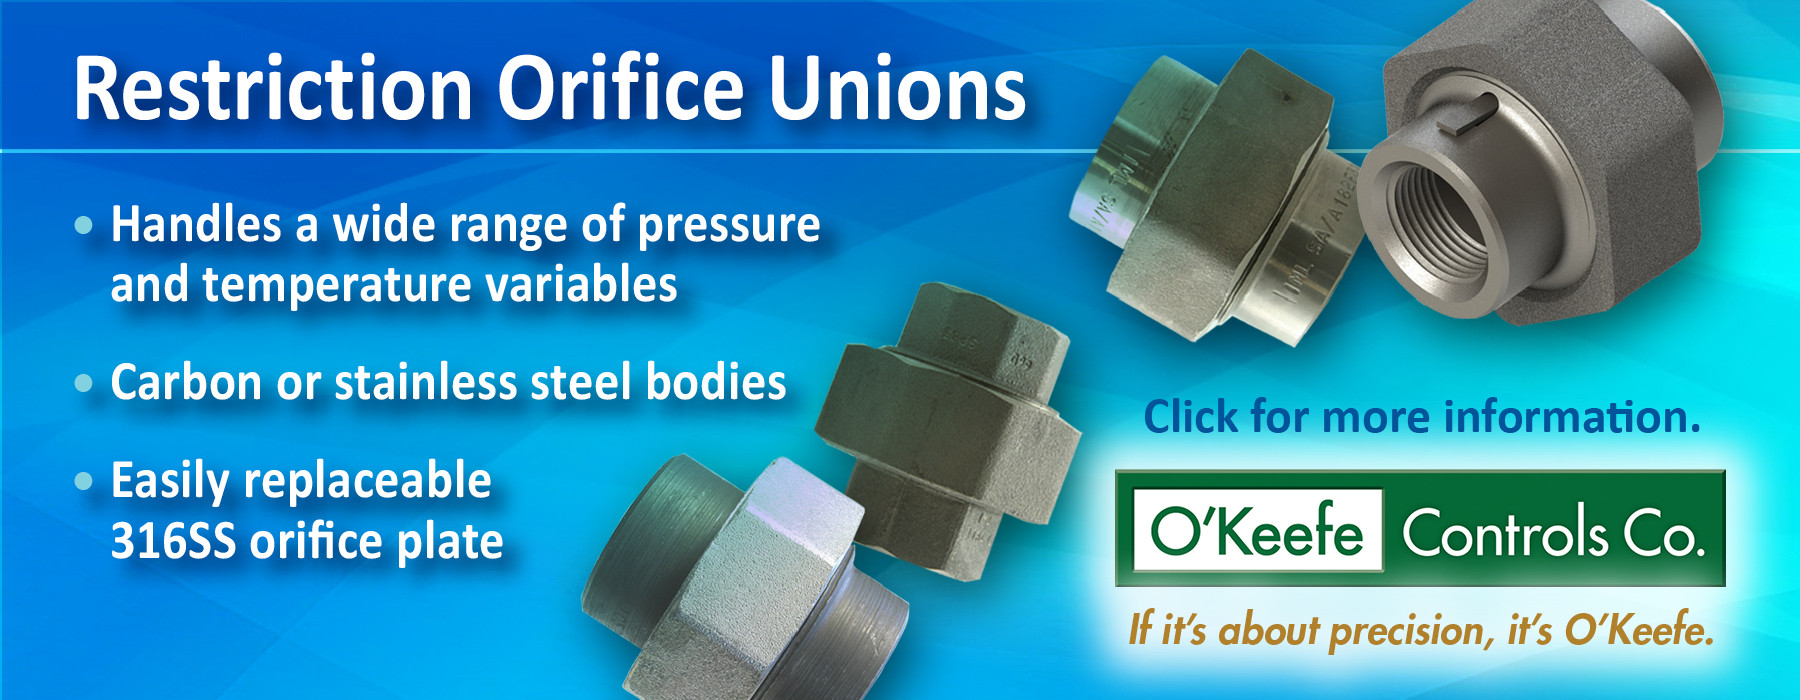 O'Keefe Controls Co. Restriction Union Orifice Digital Banner Ad Sample